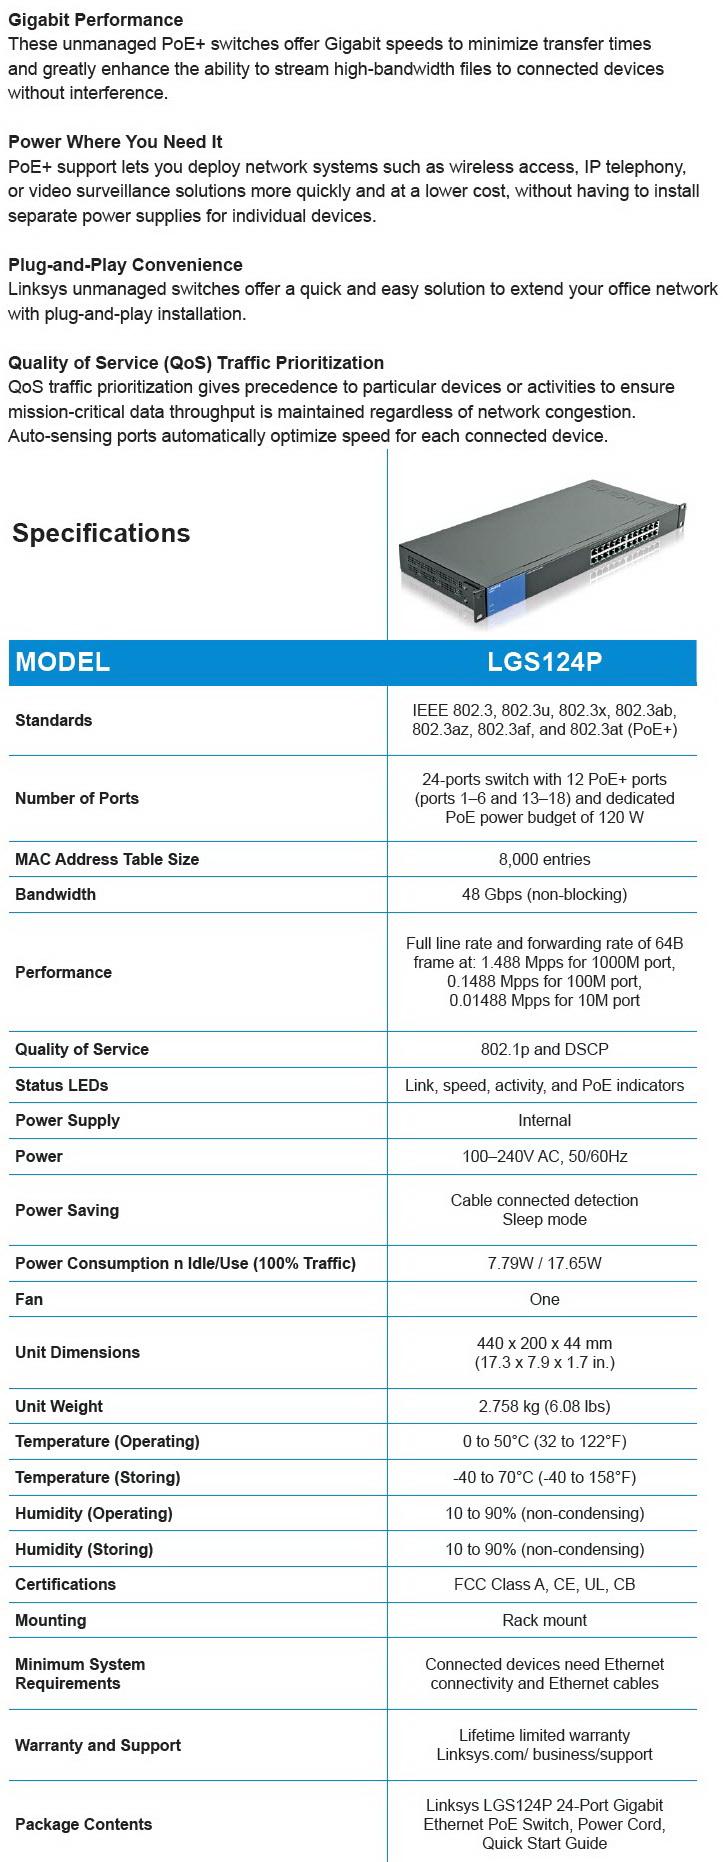 Linksys LGS124P 24-Port Business Gigabit PoE+ Switch Review